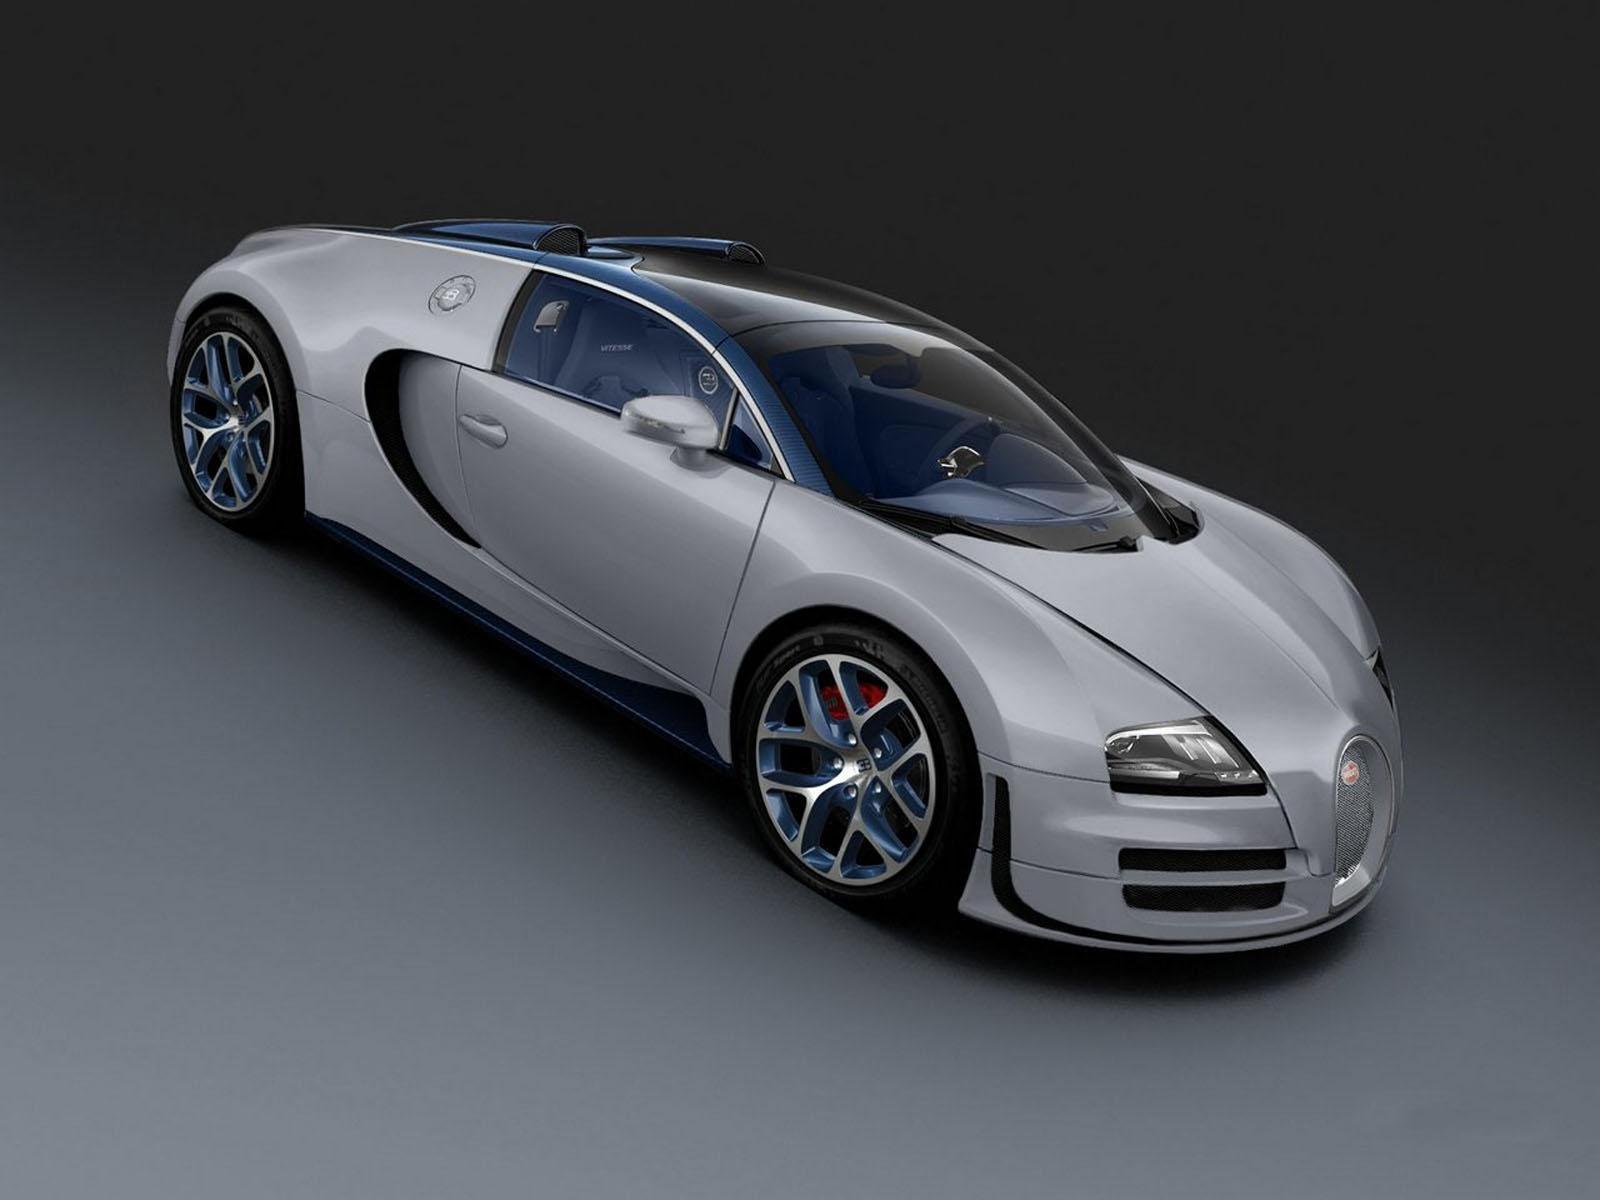 salon-de-sao-paulo-2012-bugatti-grand-sport-vitesse-en-vivo-y-en-directo-201212151_154834 Remarkable Bugatti Veyron Grand Sport Vitesse Informacion Cars Trend